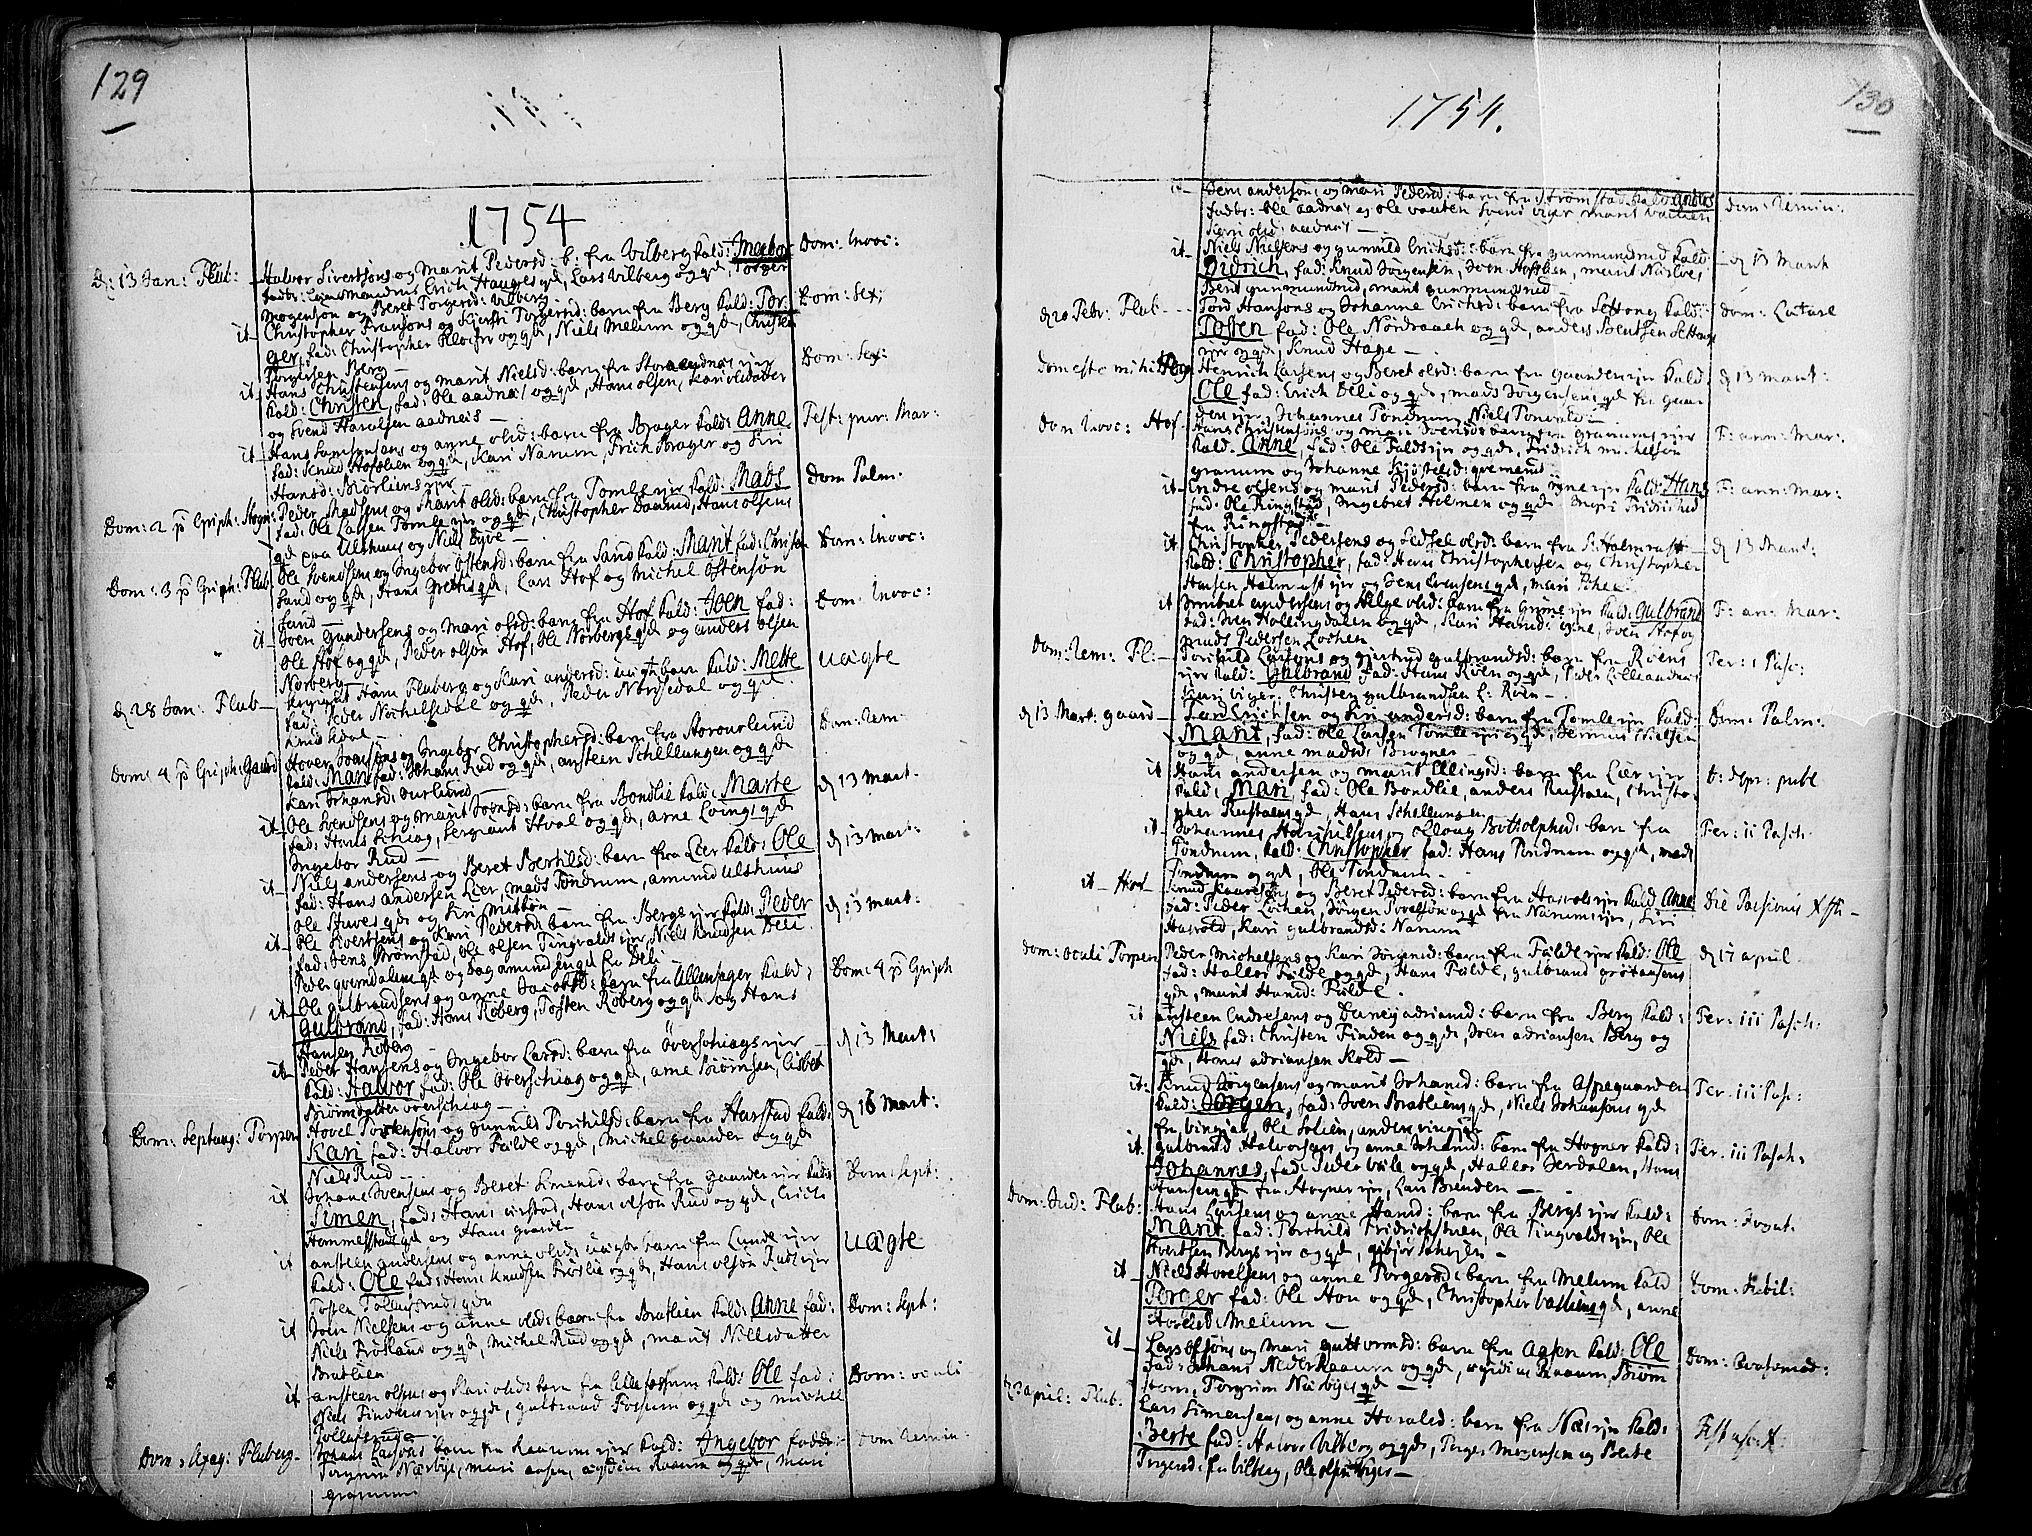 SAH, Land prestekontor, Ministerialbok nr. 2, 1733-1764, s. 129-130